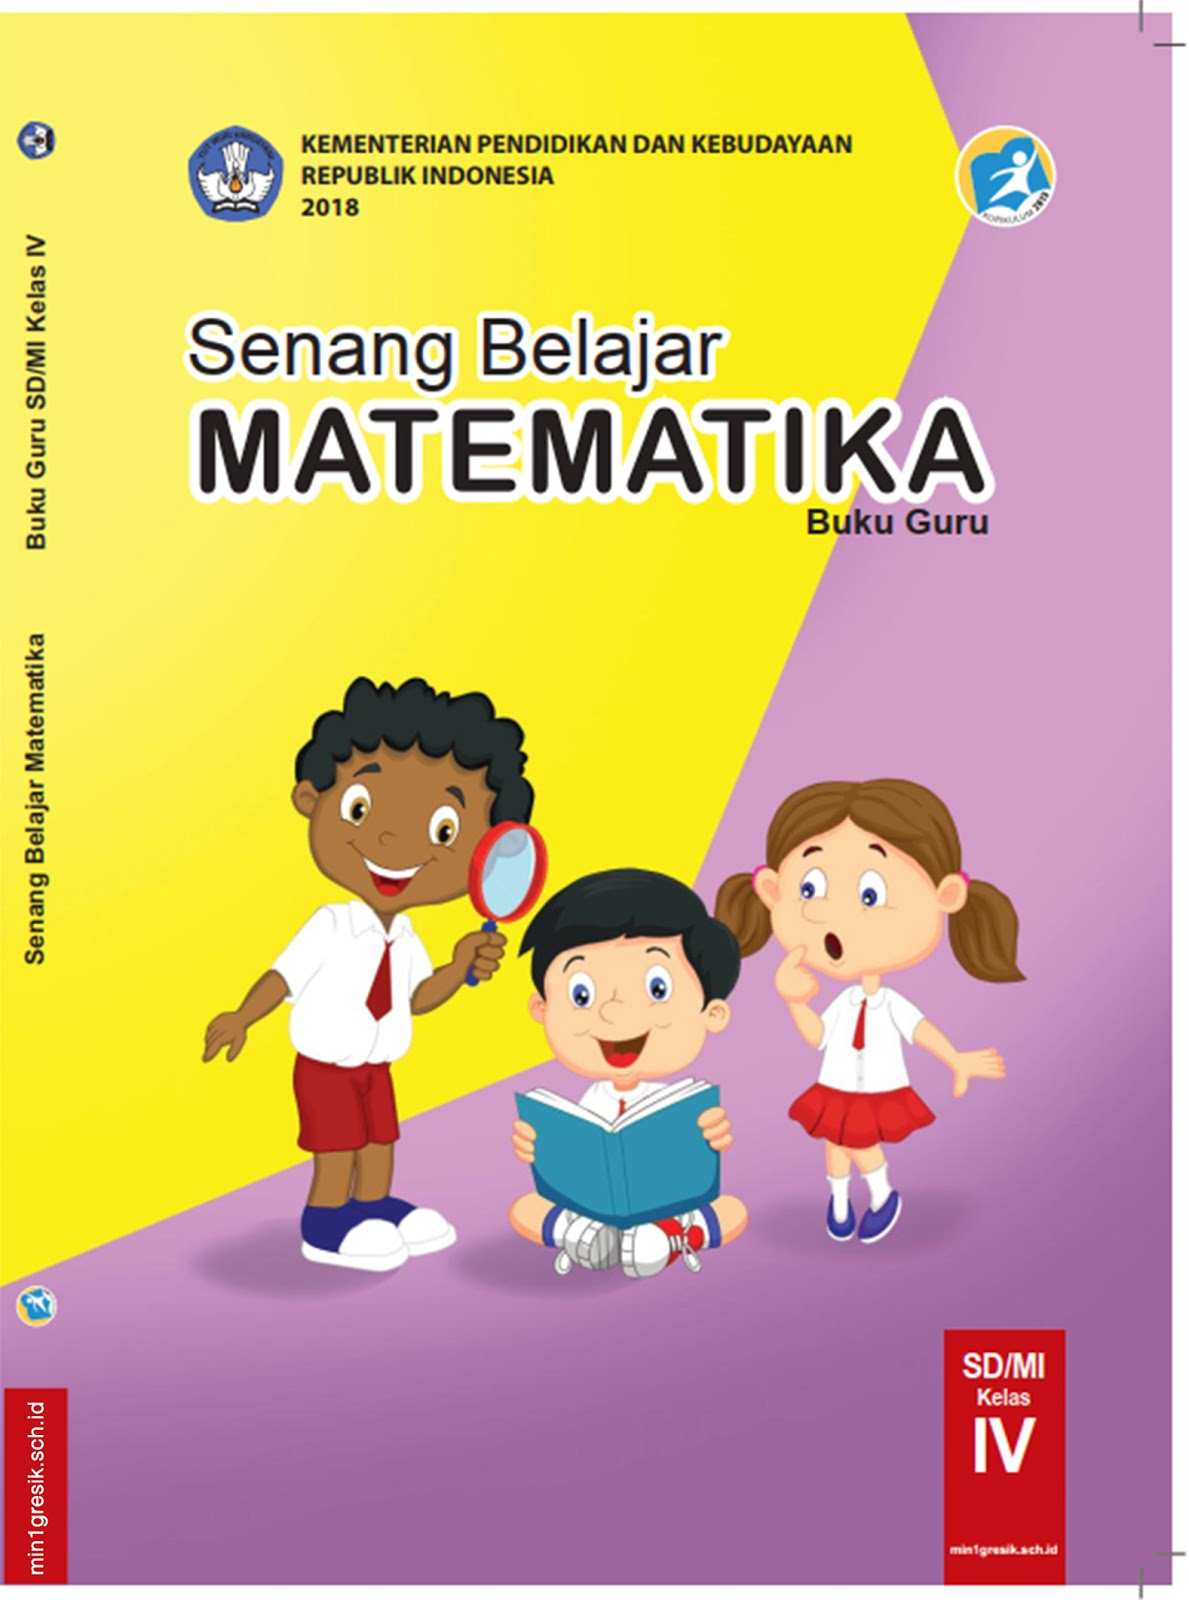 Pelajaran Matematika Kelas 4 Sd : pelajaran, matematika, kelas, Pelajaran, MATEMATIKA, Untuk, Kelas, SD/MI, Kurikulum, (Edisi, Revisi, Tahun, 2018), Gresik